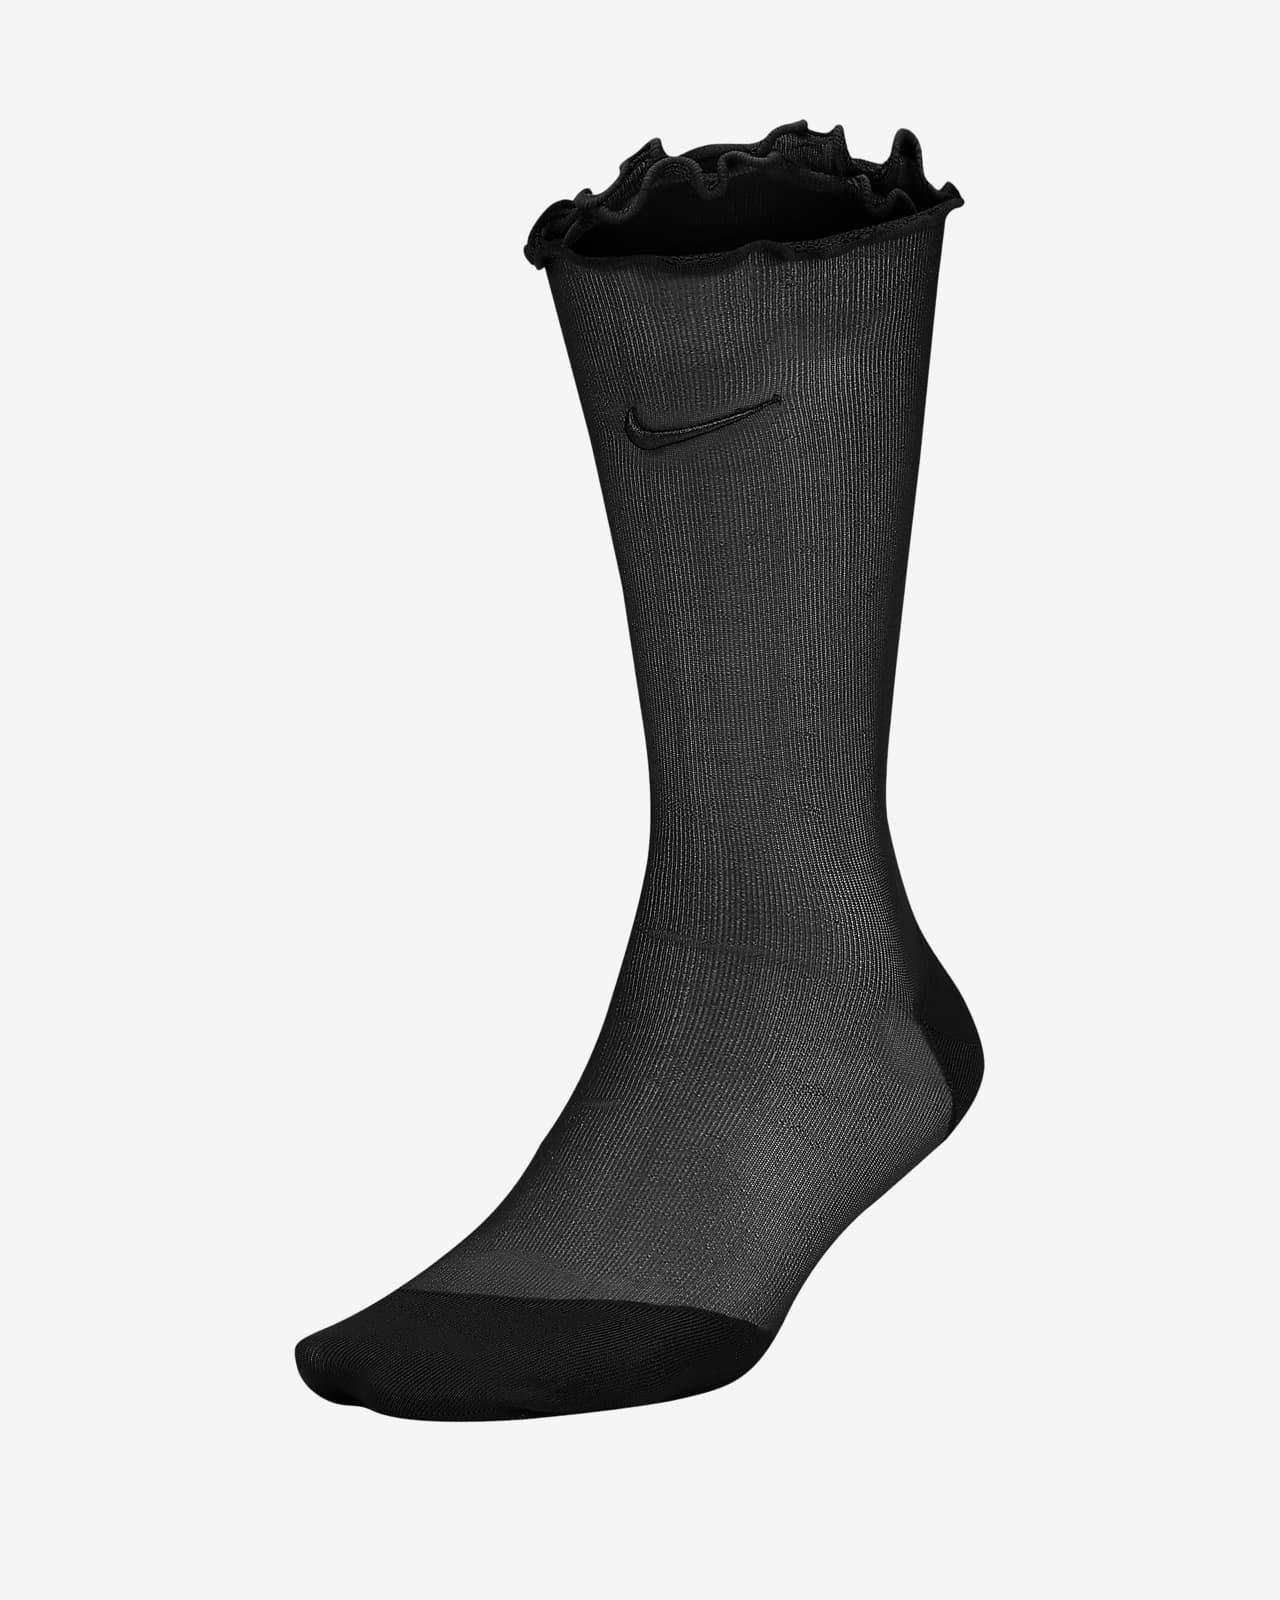 Socquettes de traning Nike Sheer pour Femme